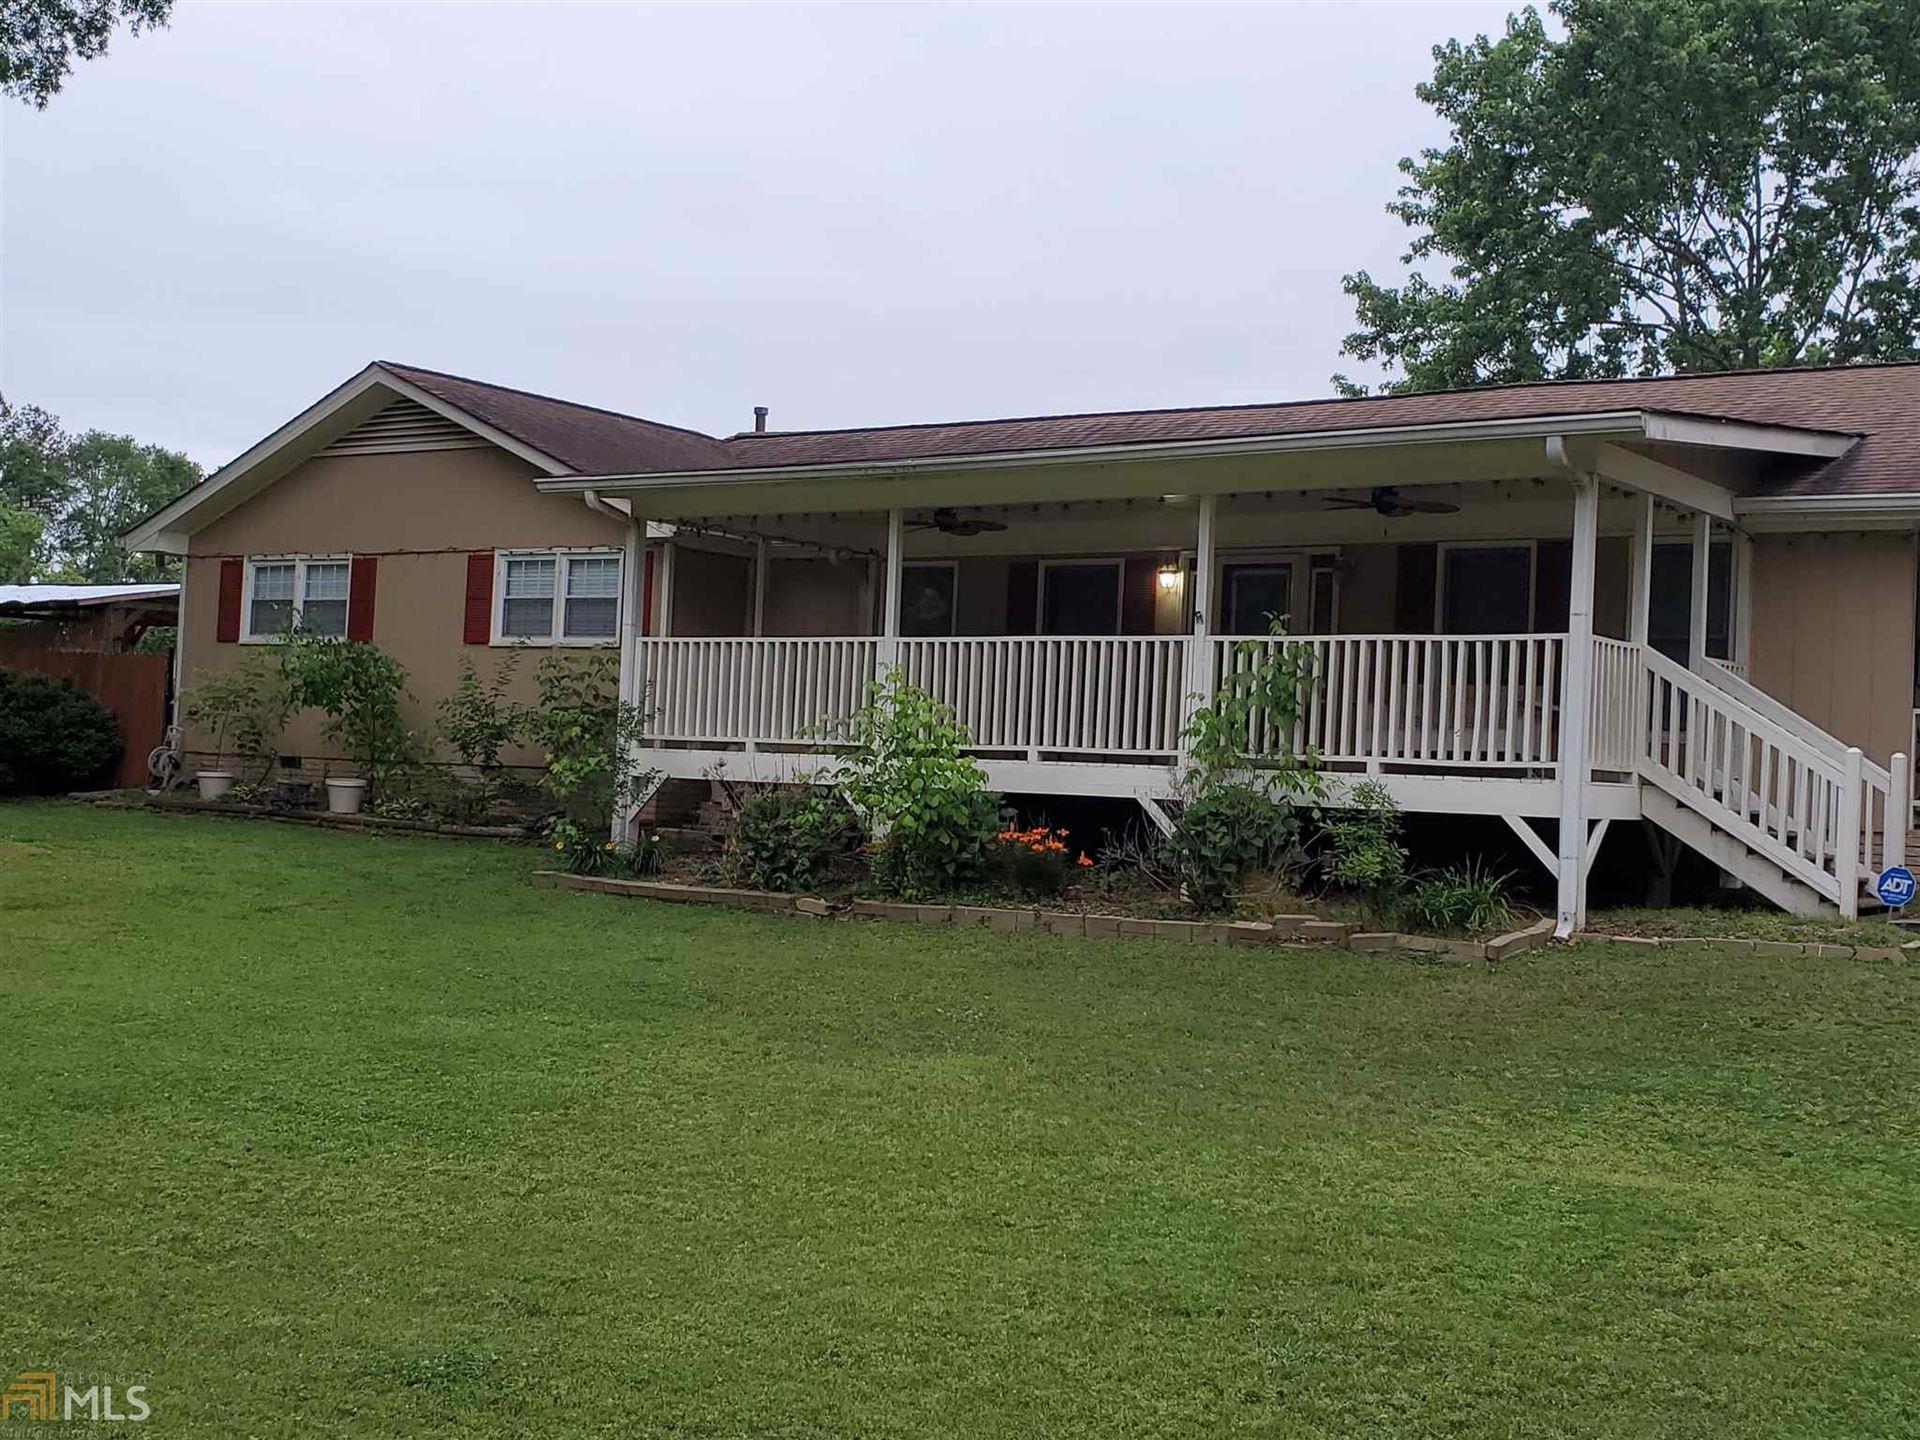 4951 Cheryl Cir, Powder Springs, GA 30127 - #: 8790253